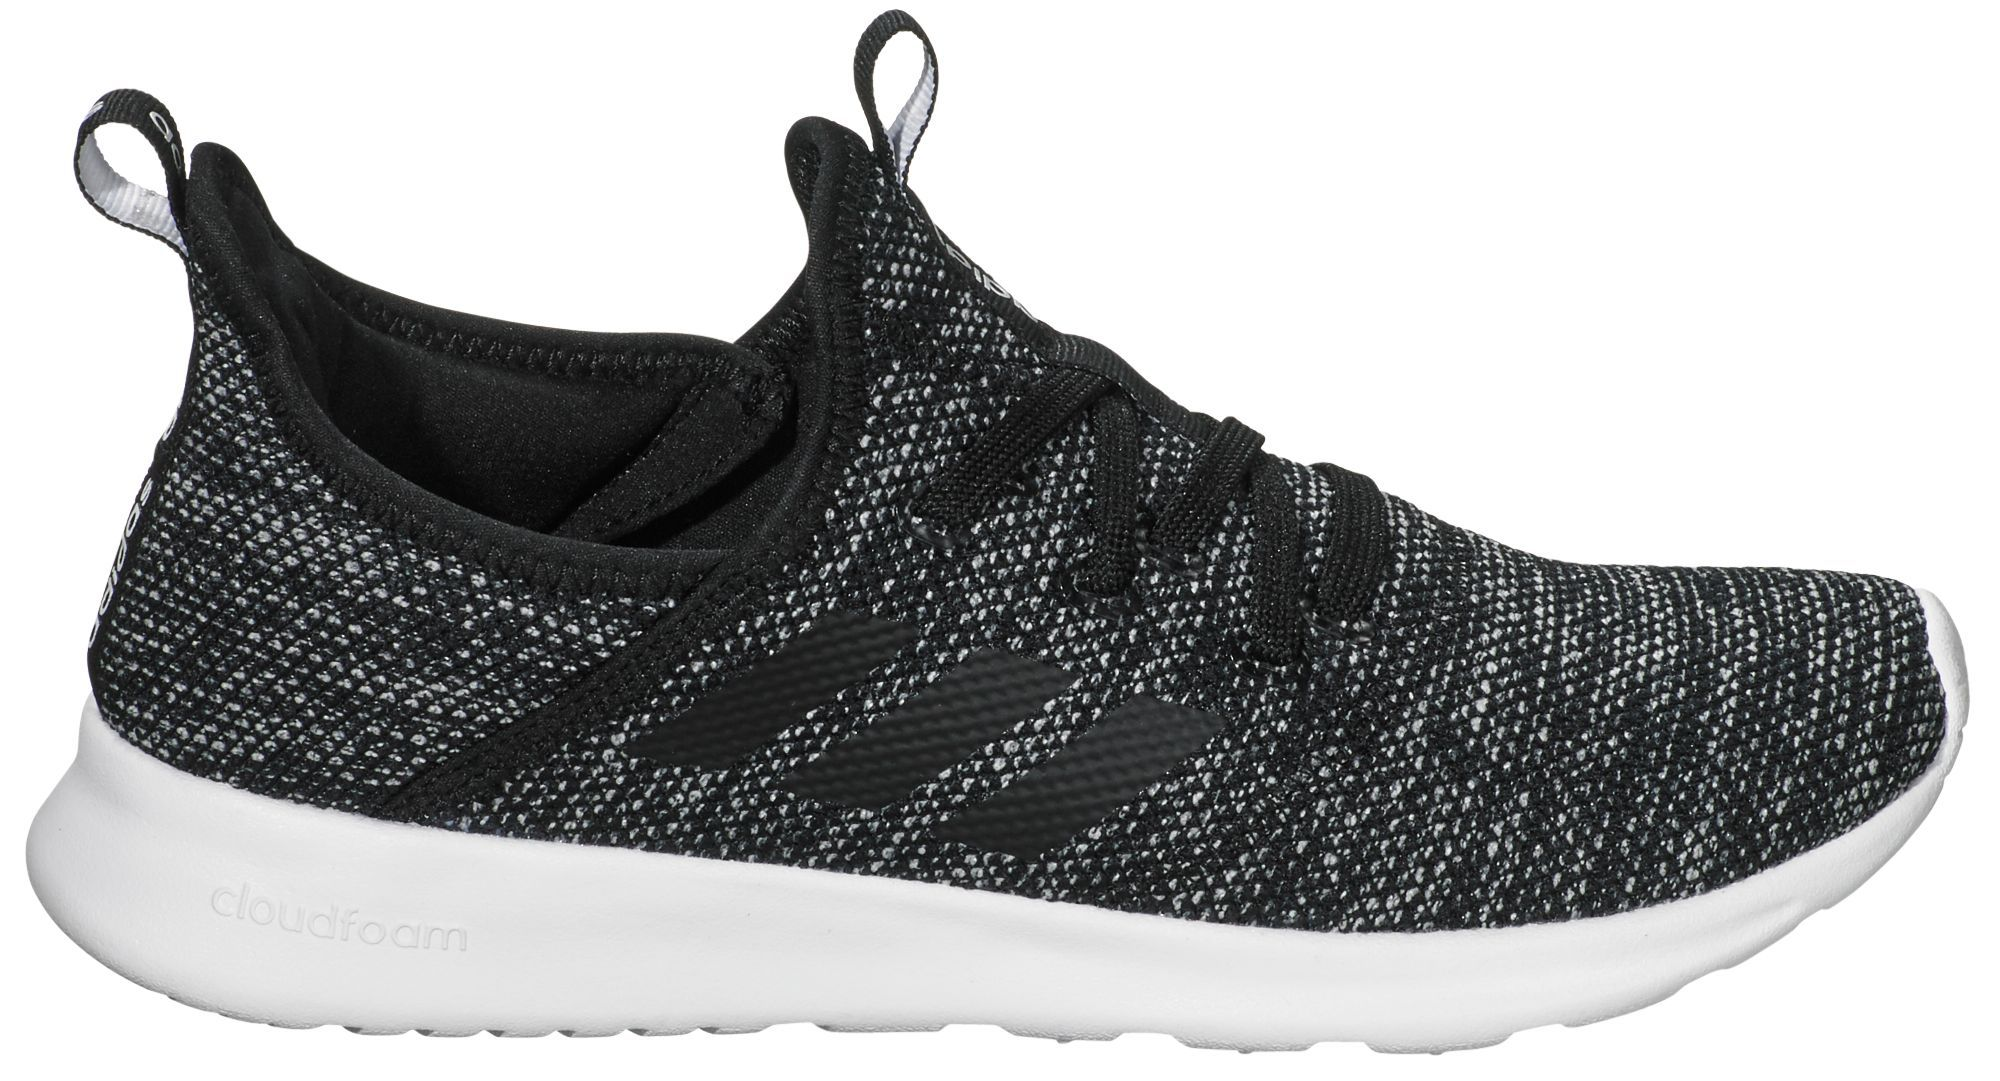 Adidas  mujer 's cloudfoam puro zapatos, tamaño:, negro Pinterest